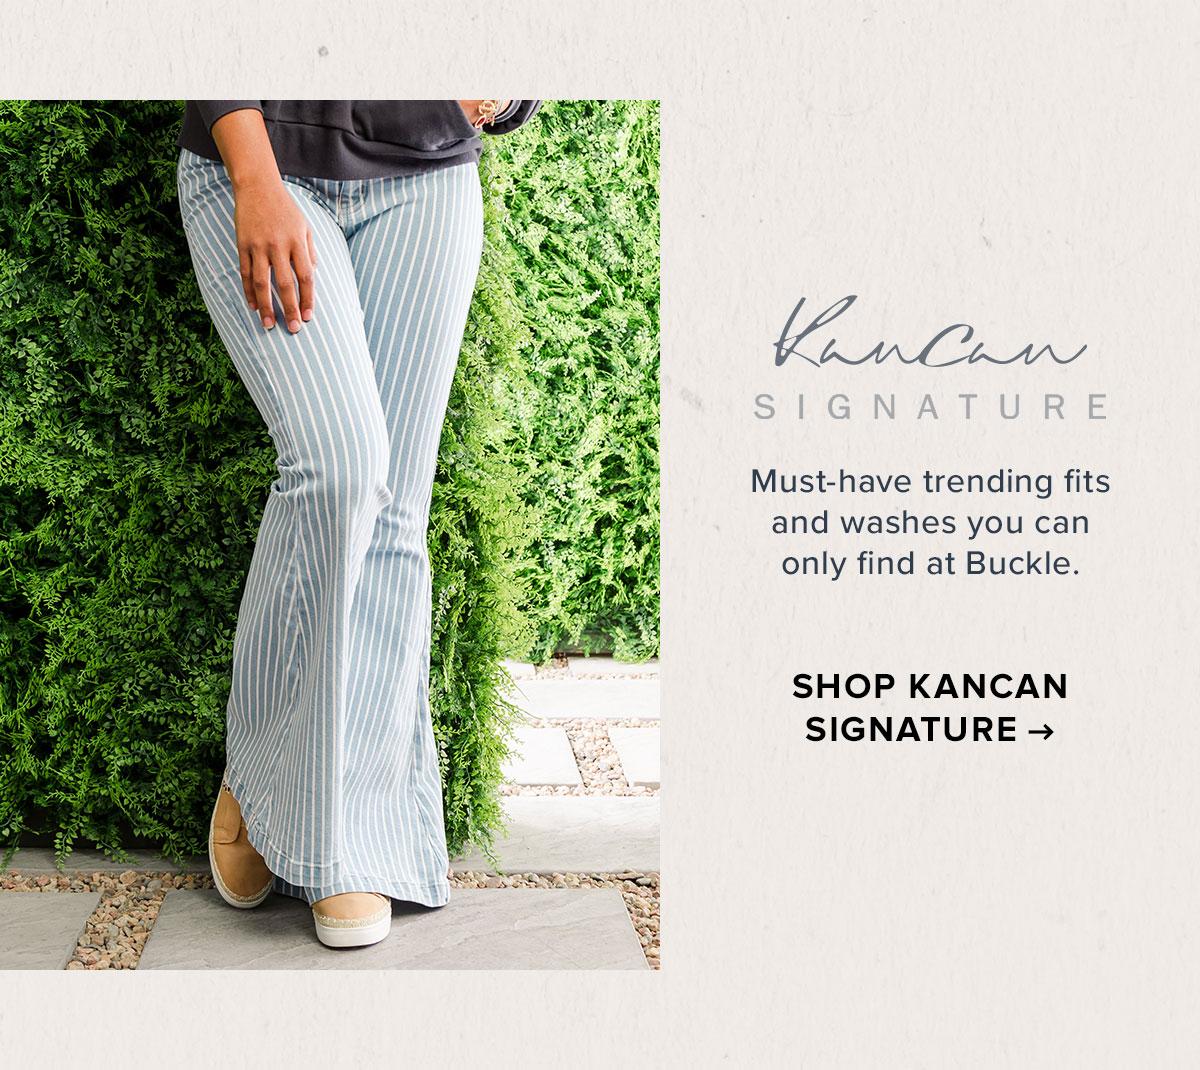 Shop Women's KanCan Signature